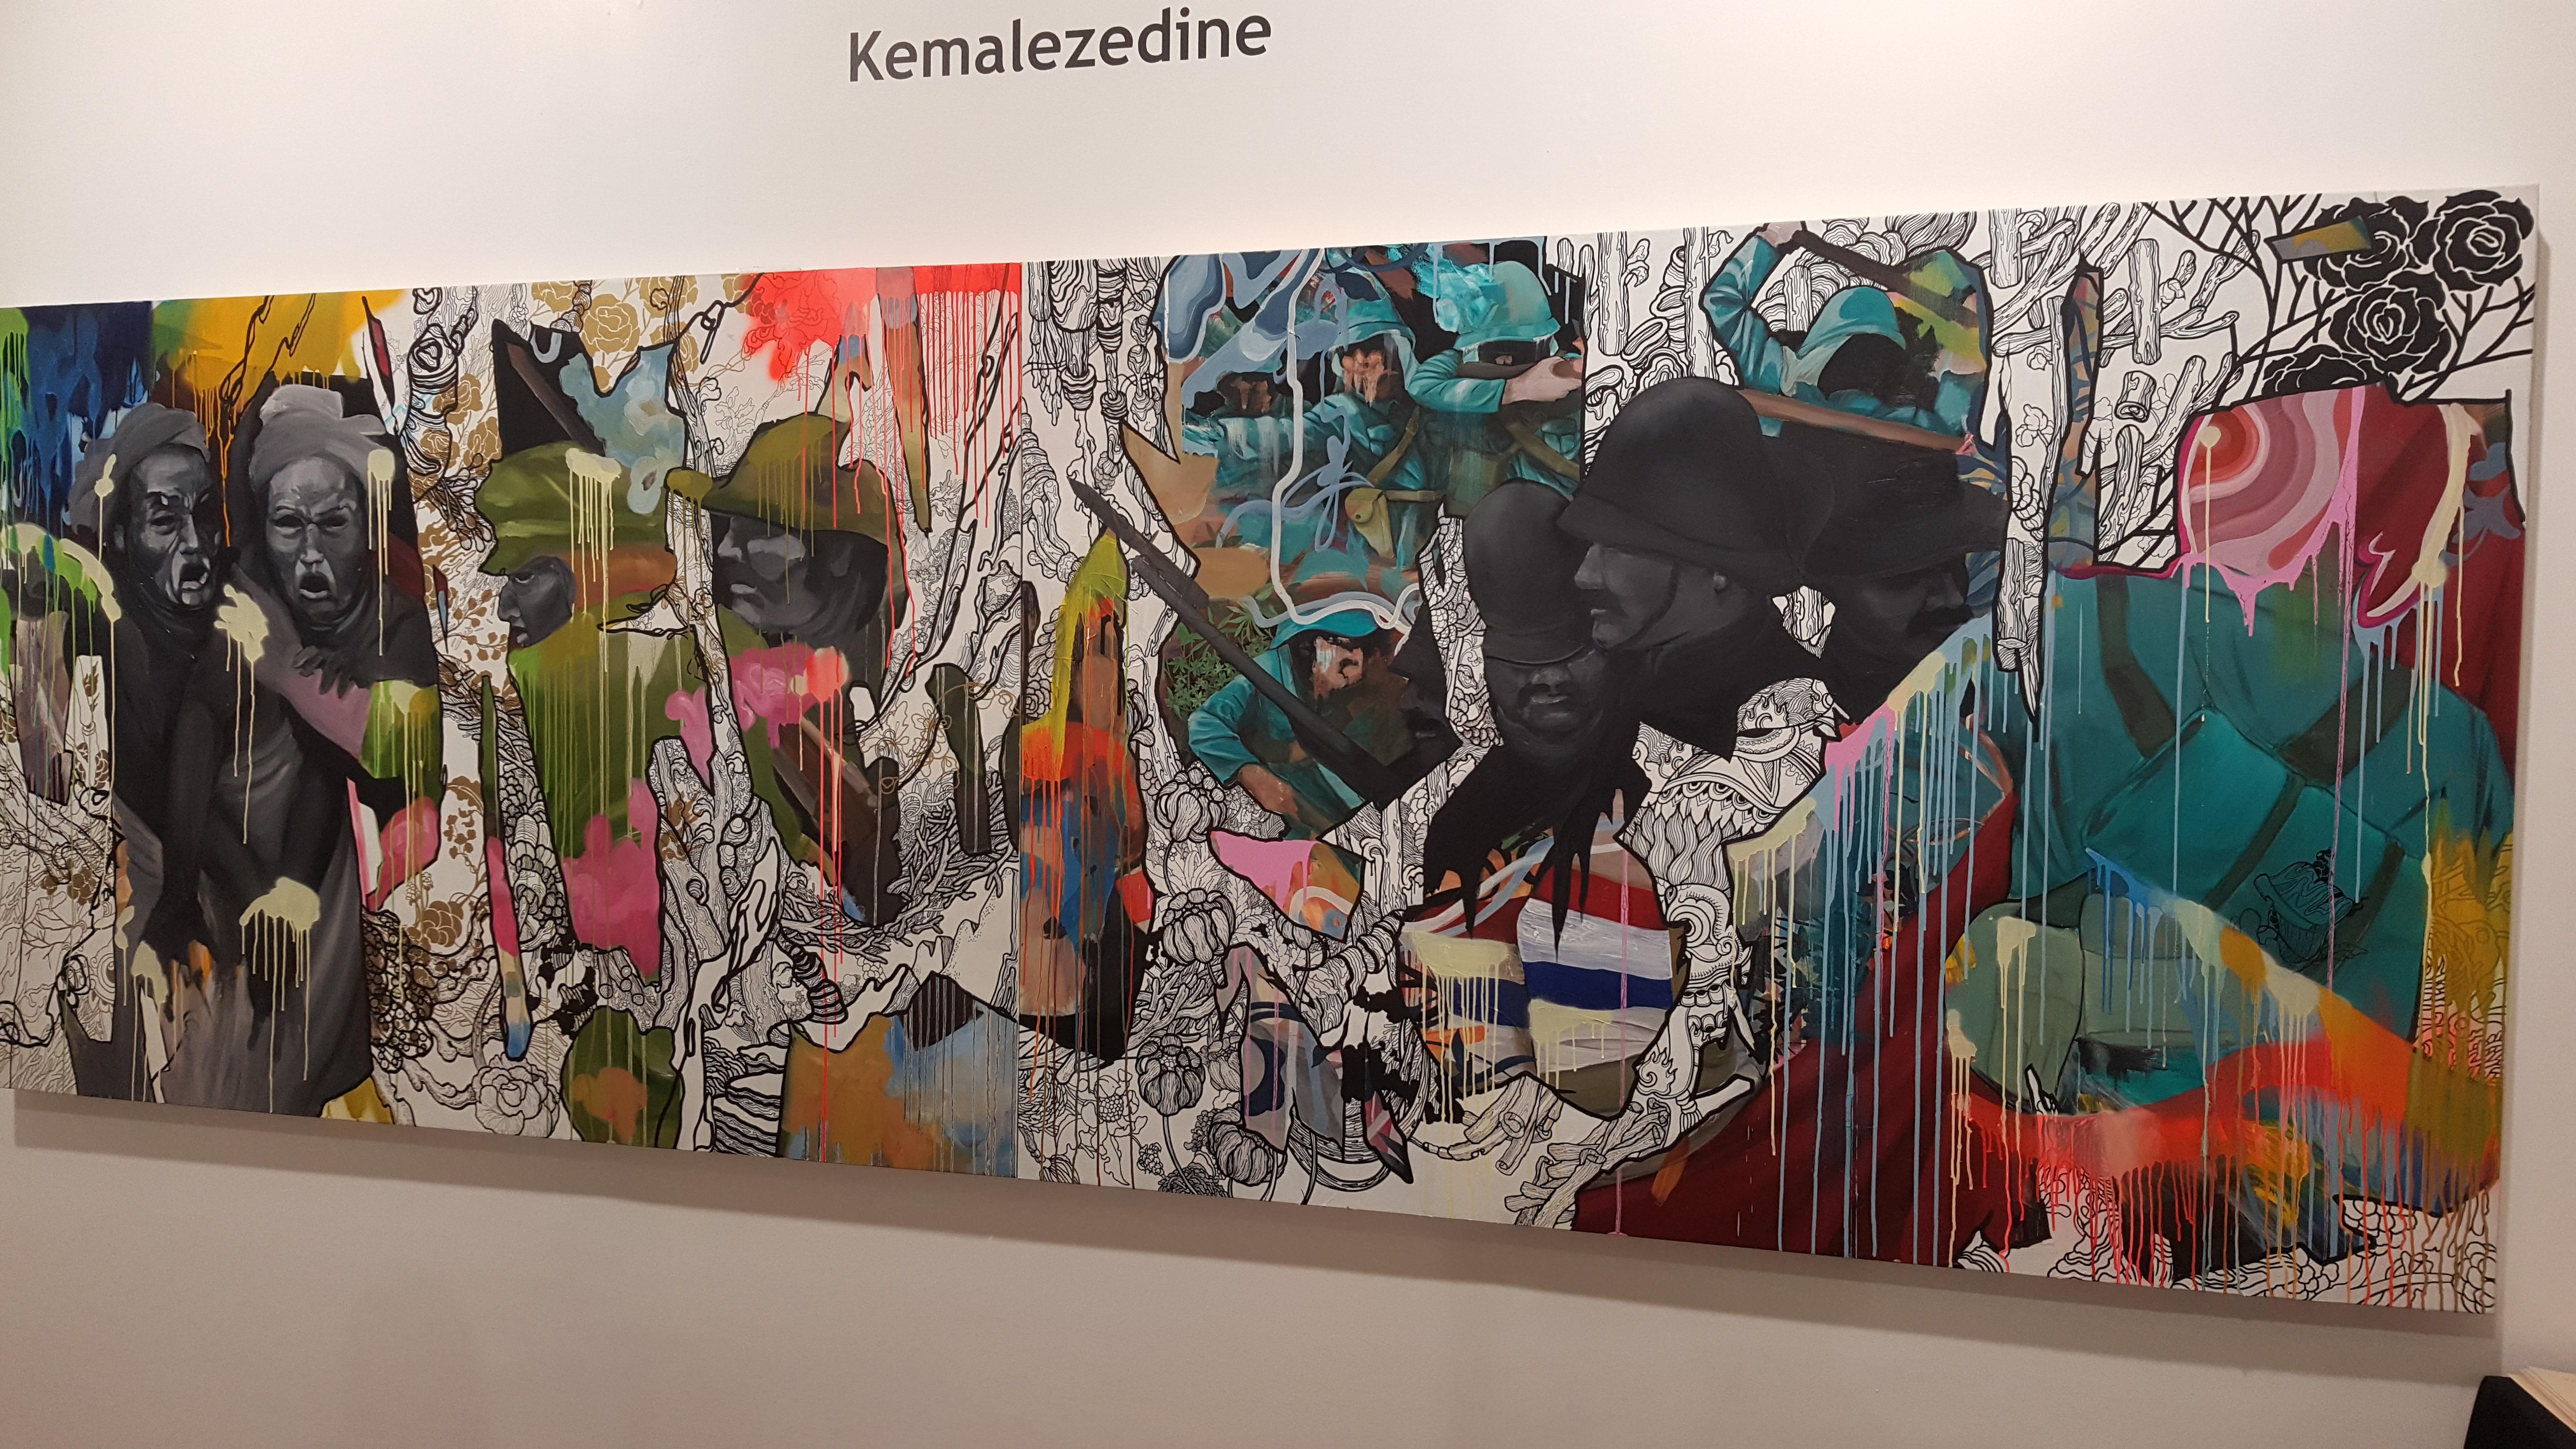 kemal-ezedine-2016-asj-image-richard-horstman